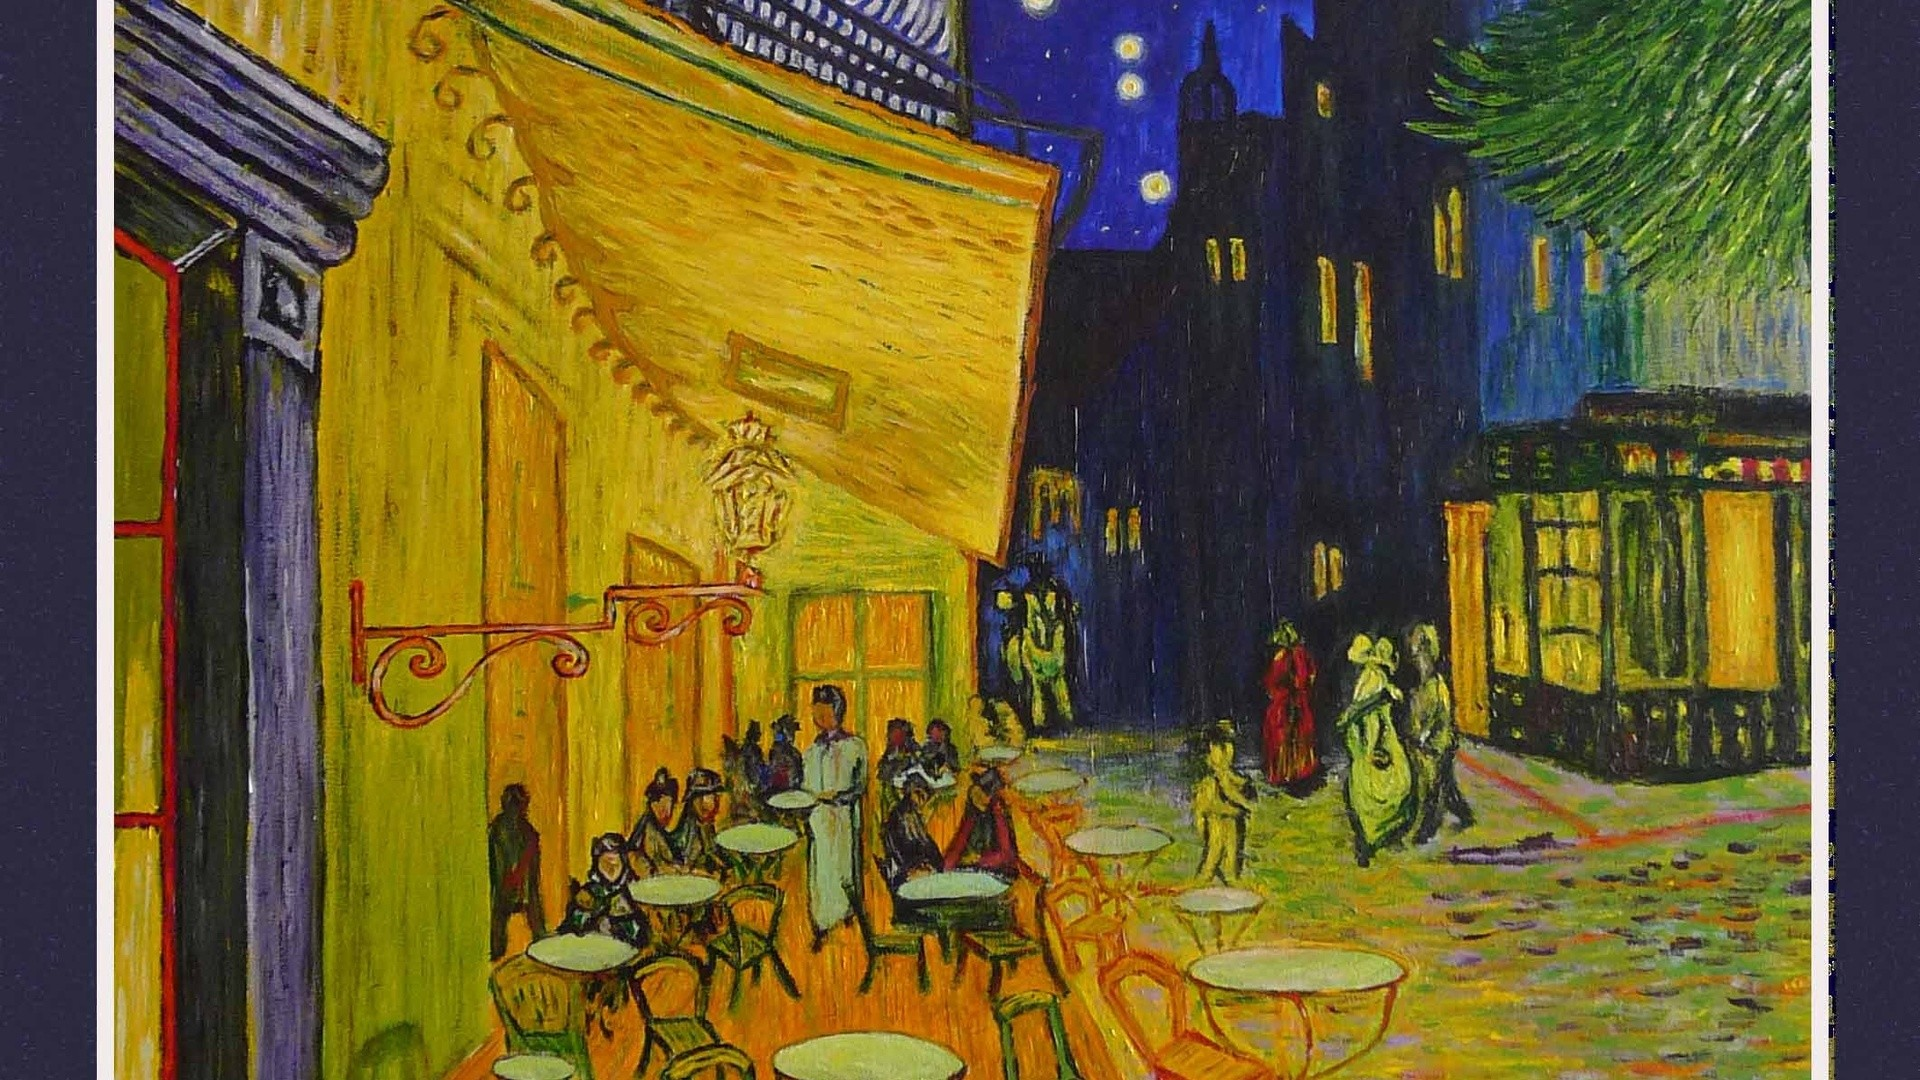 Van Gogh Desktop Wallpaper 183 ① Wallpapertag